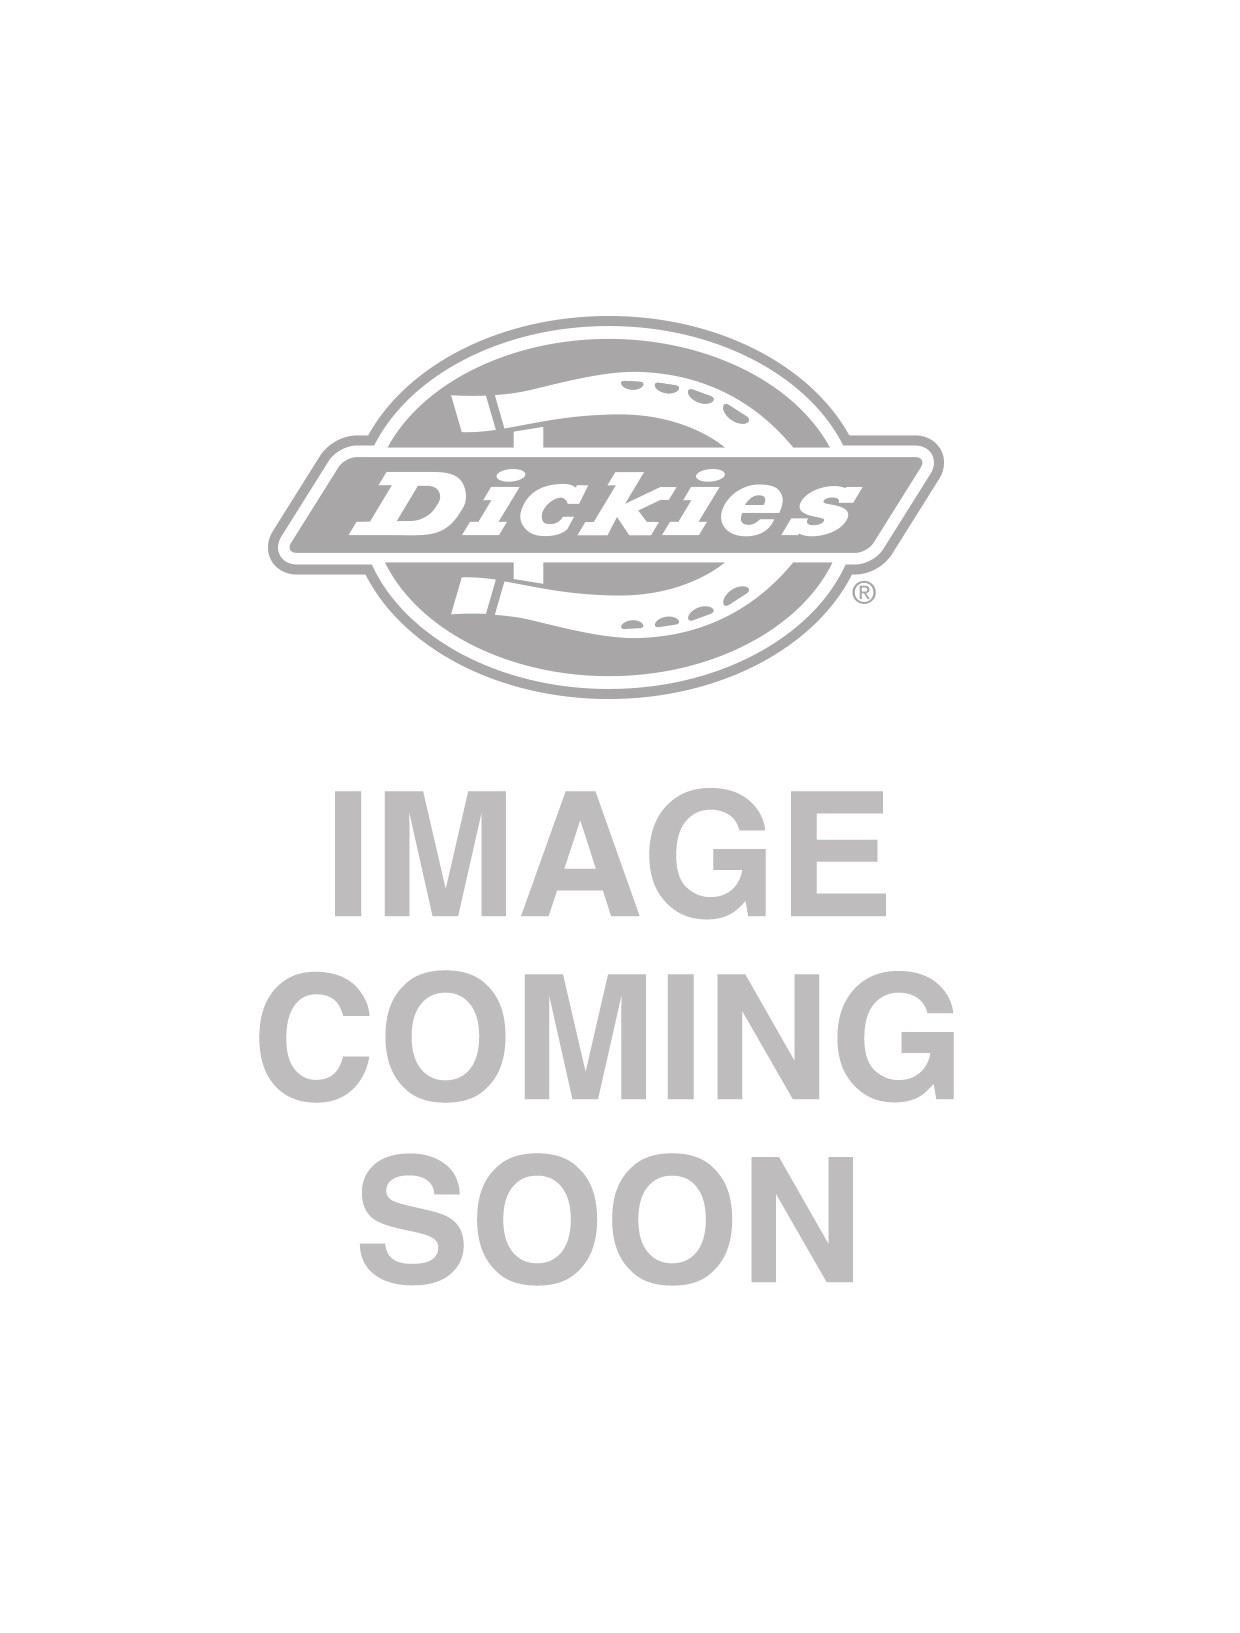 Dickies Torrance Coach Jacket